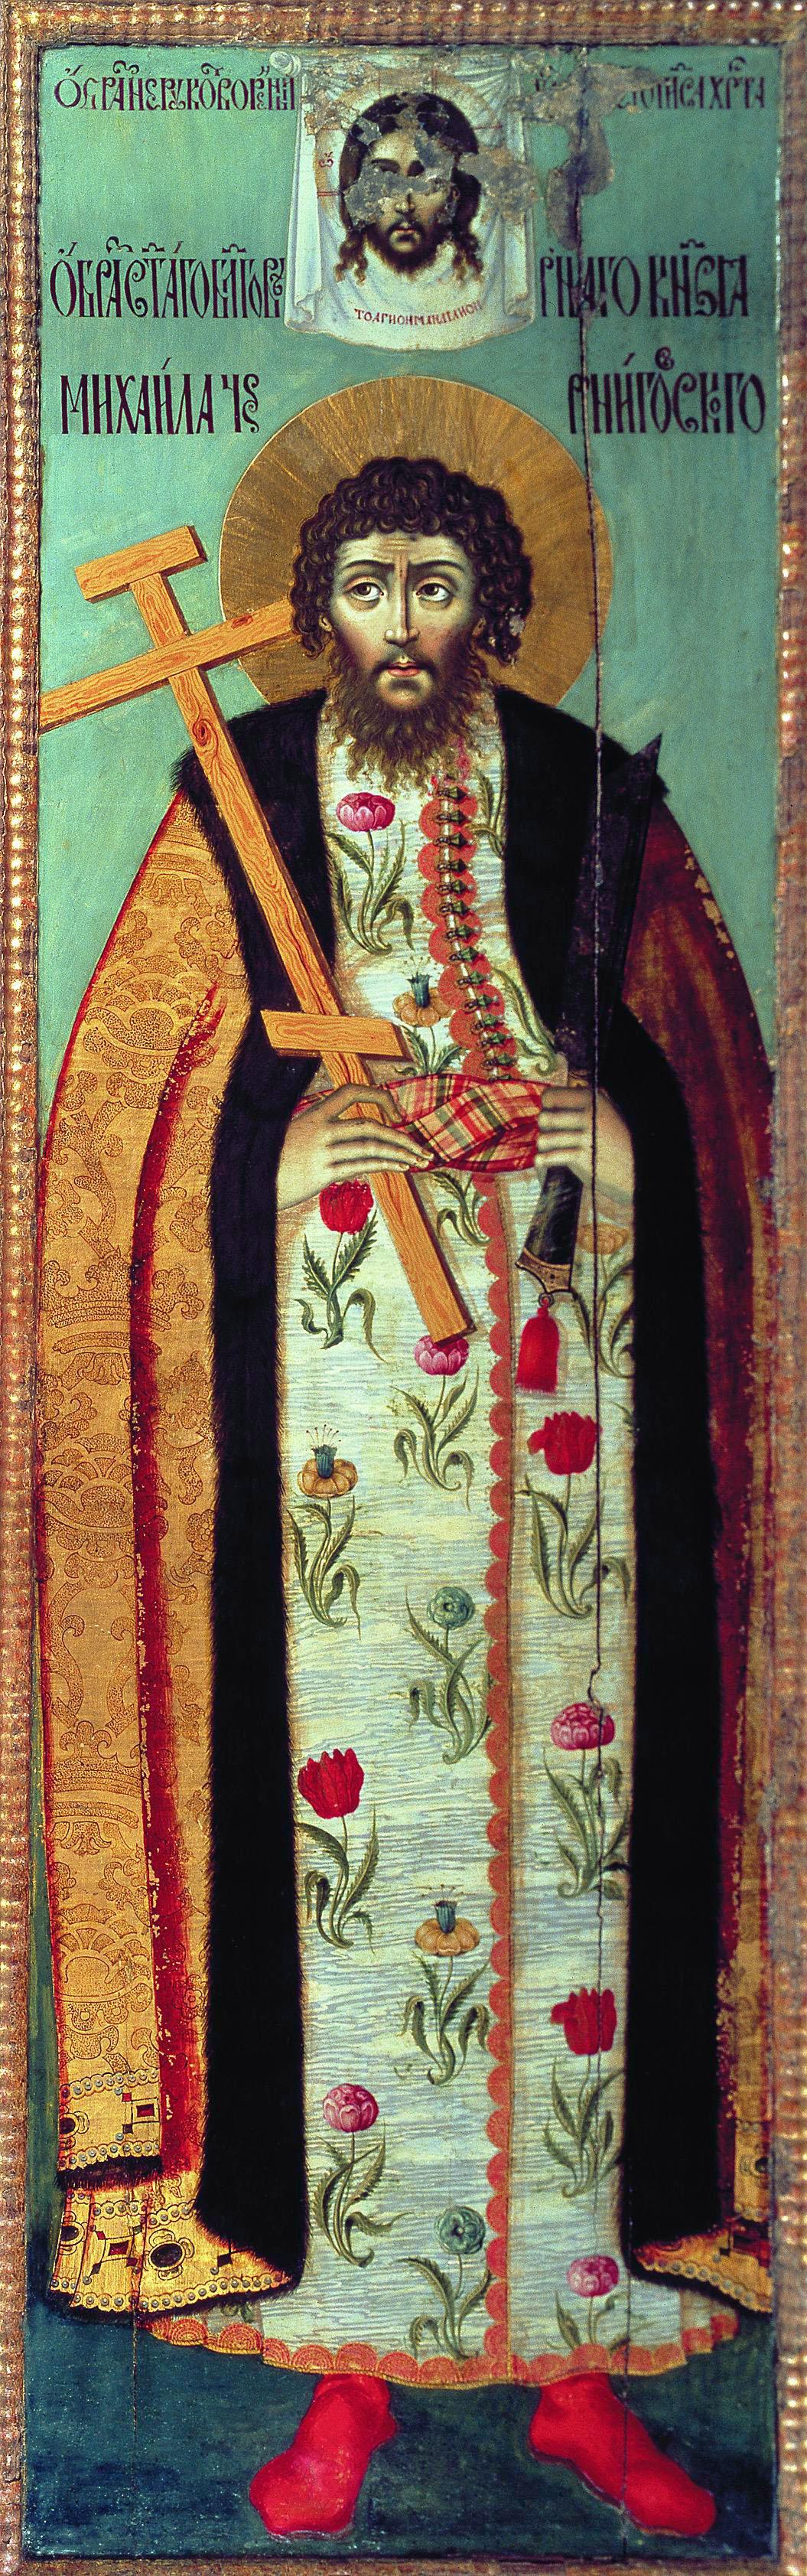 Michael of Chernigov 1688.jpg